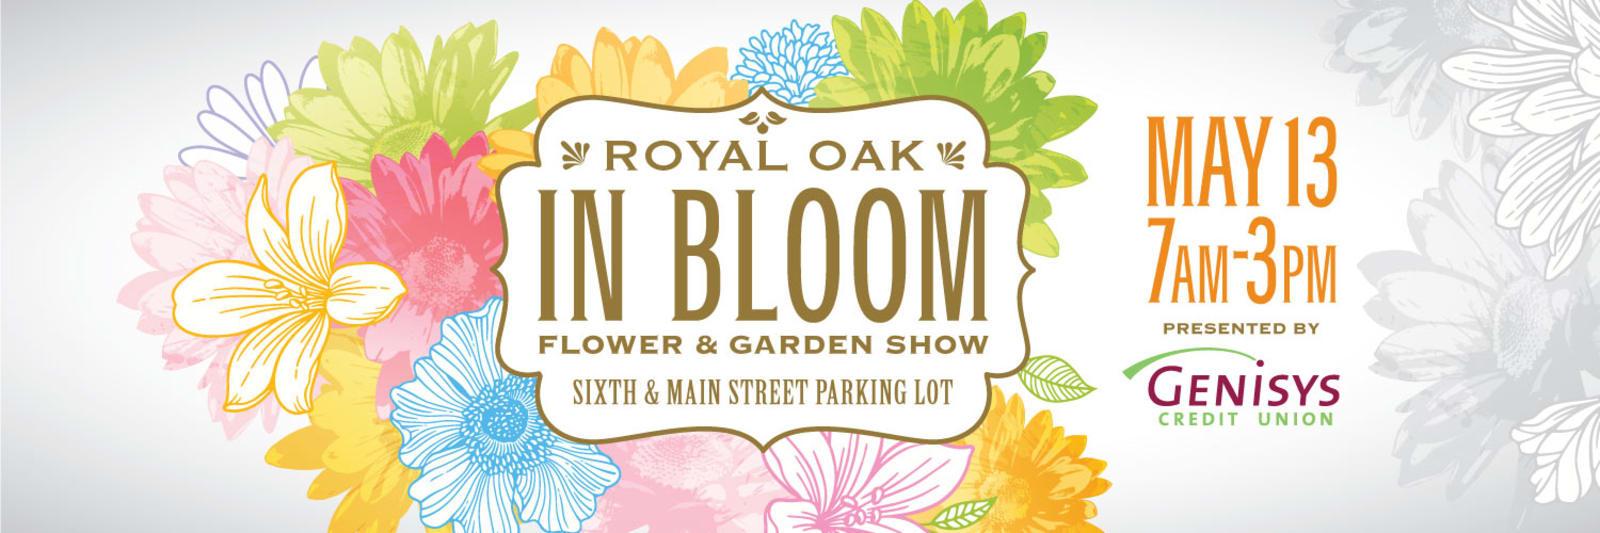 bloom-twitter-banner-w1600.jpg